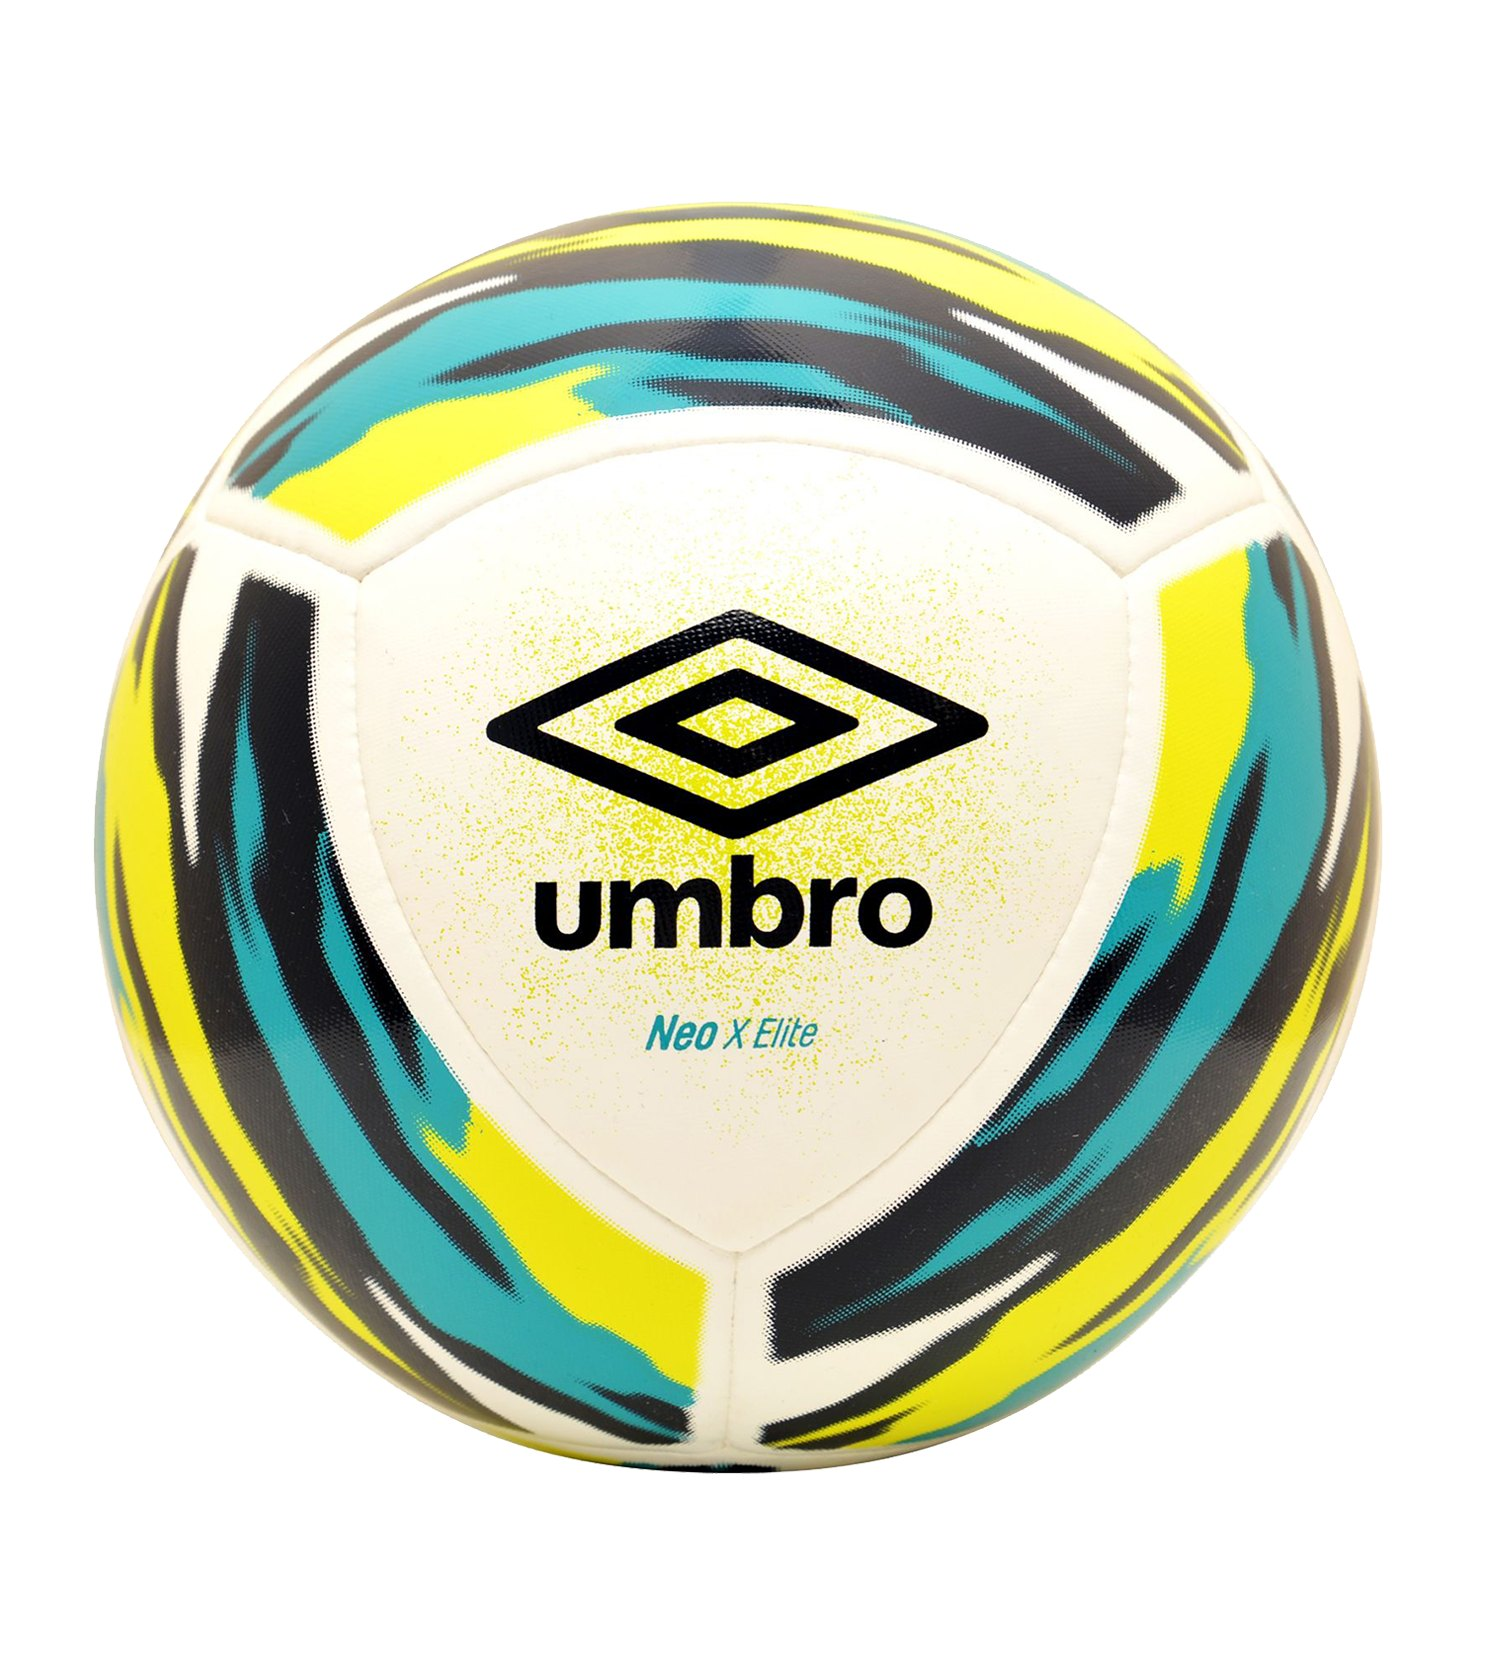 Umbro Neo X Elite Spielball Weiss Blau FJPA - weiss